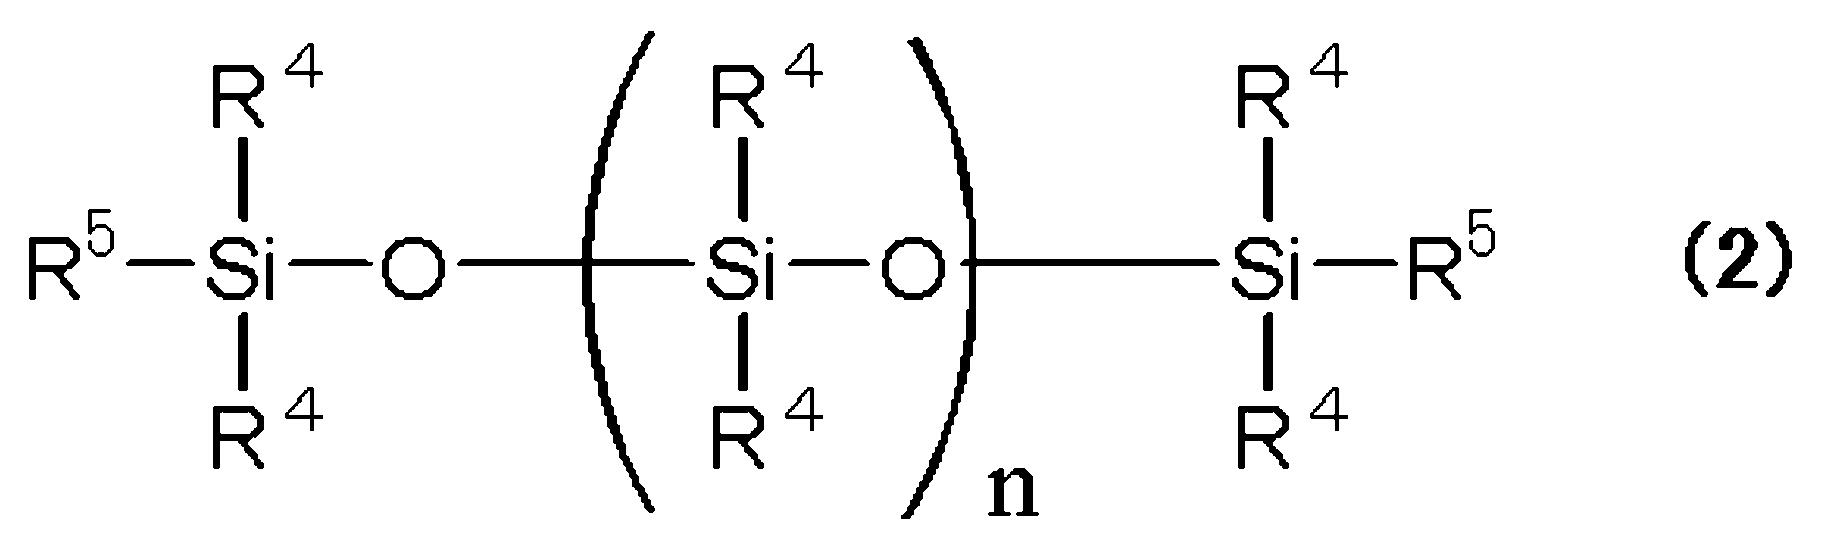 Figure 112013032283310-pat00033